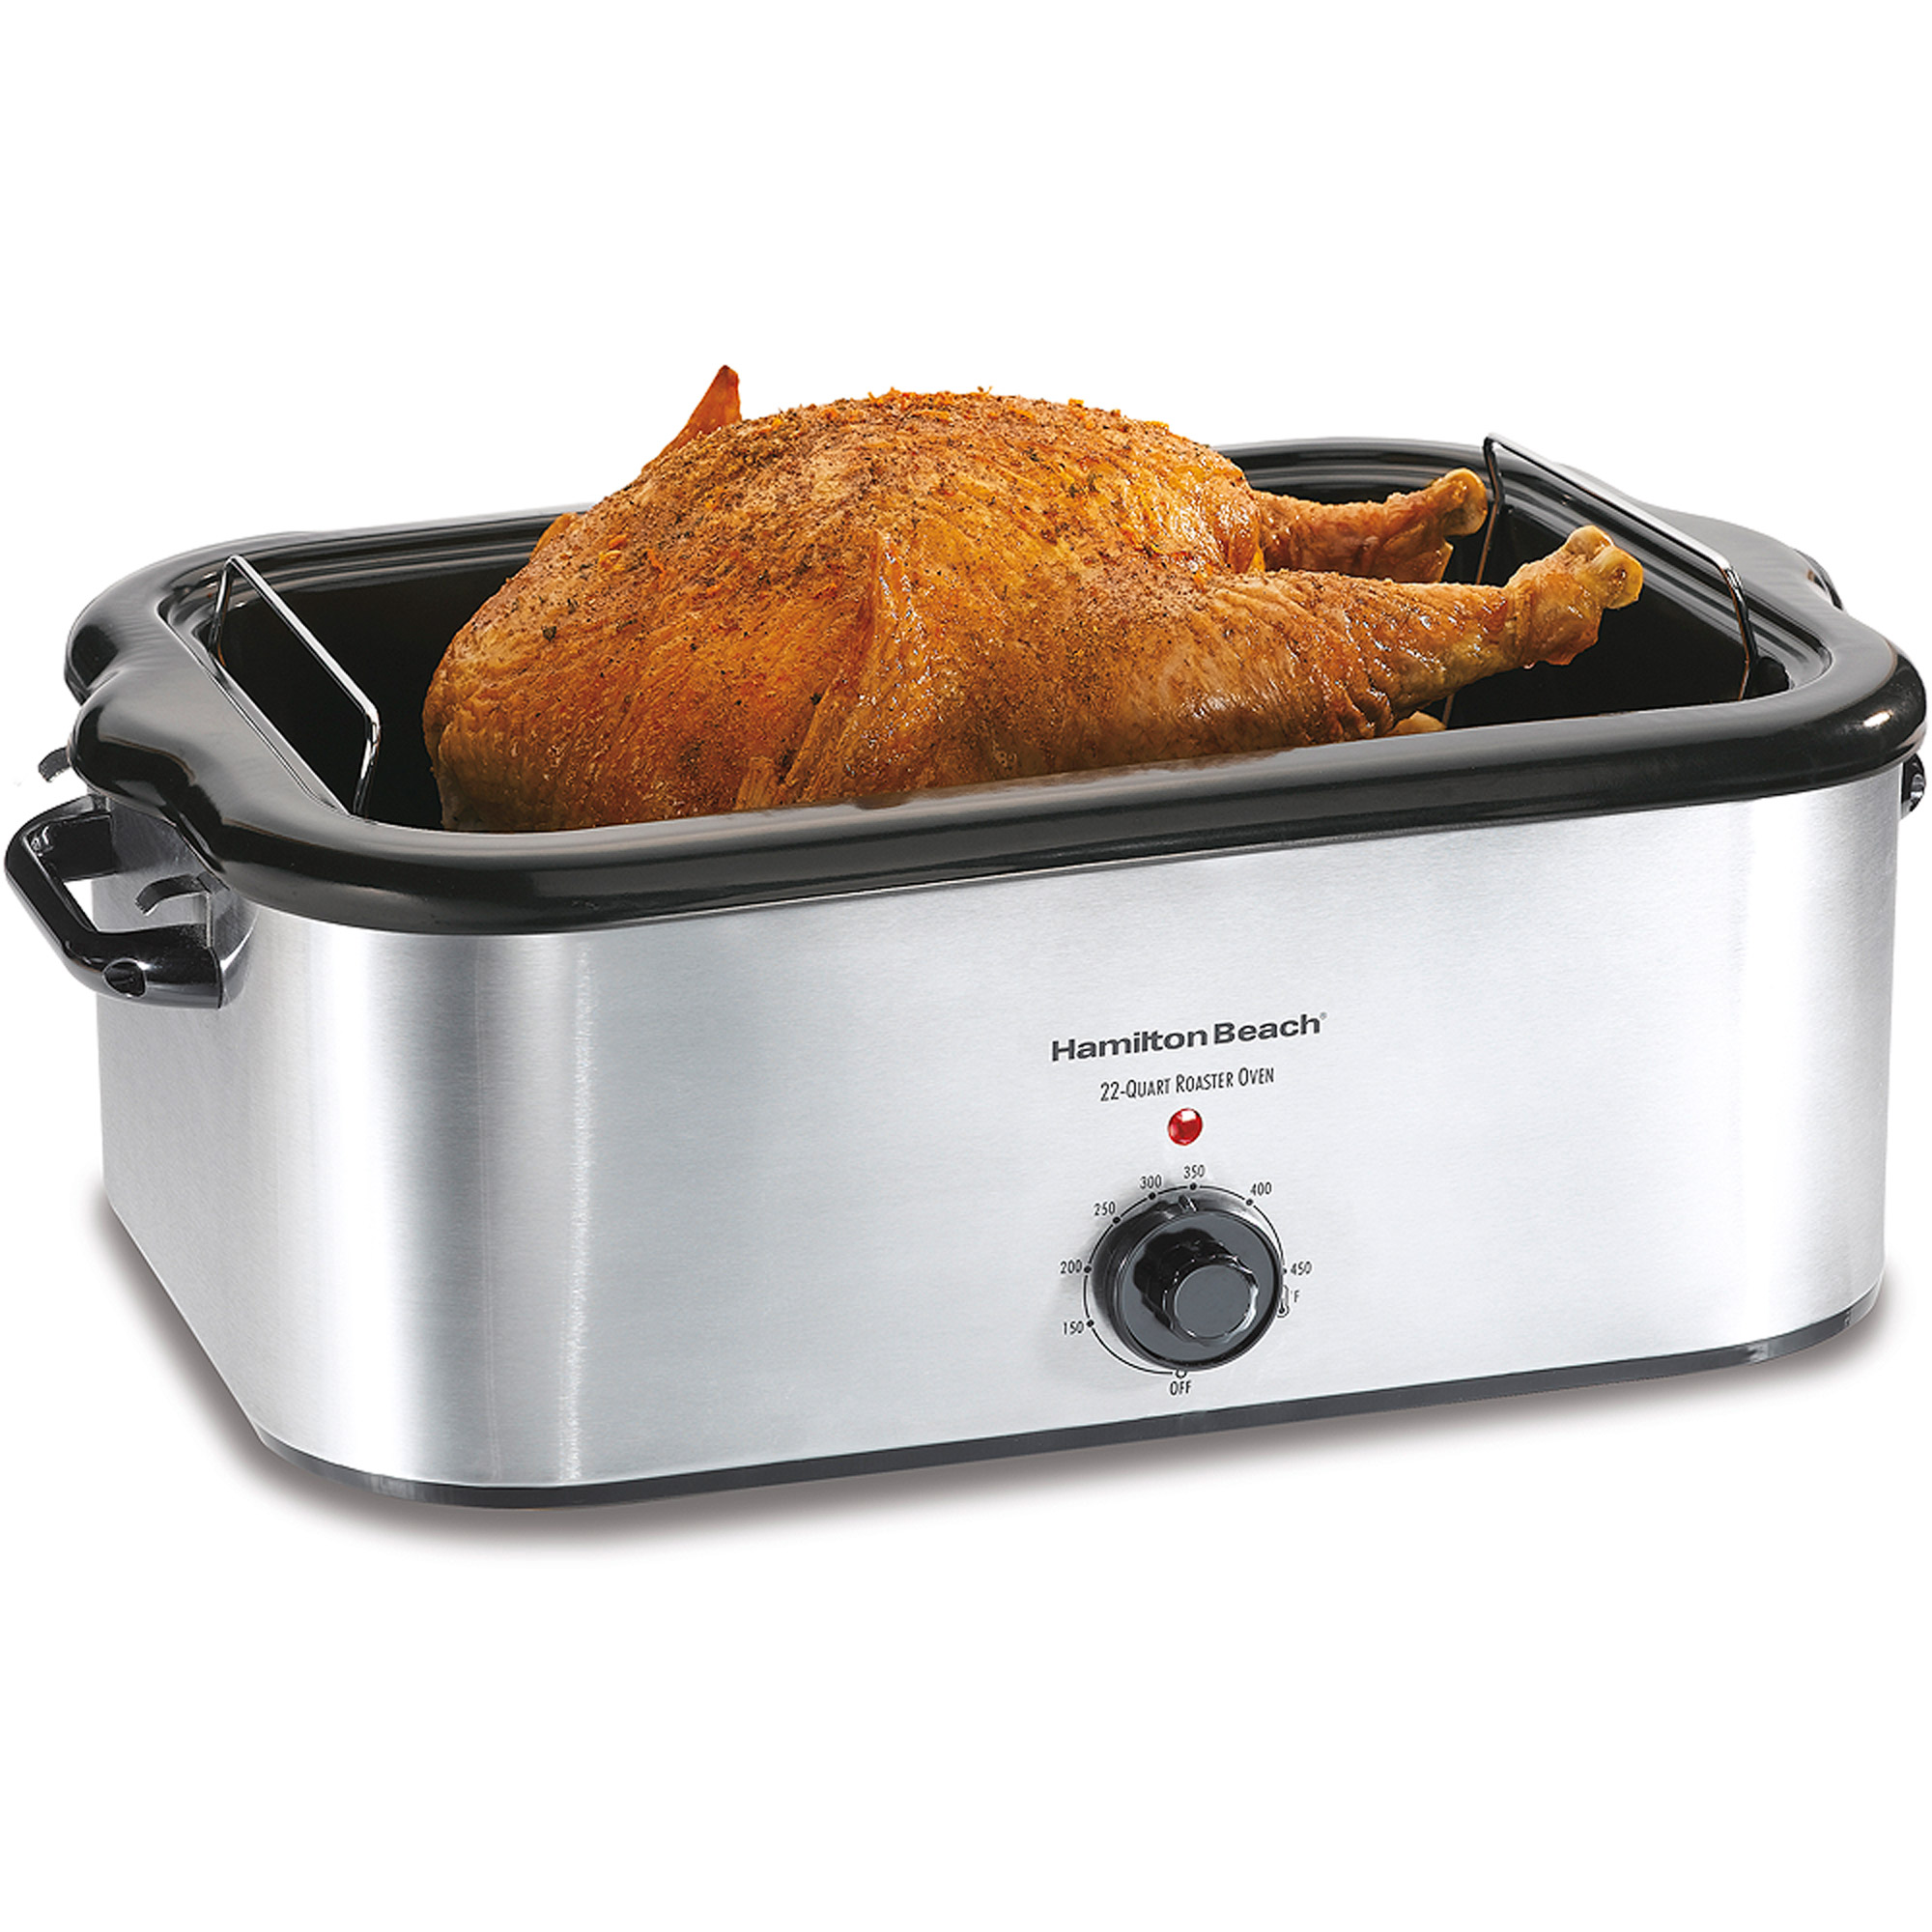 Hamilton Beach 24-Pound Turkey Roaster Oven, 22 Quart Capacity - Stainless Steel